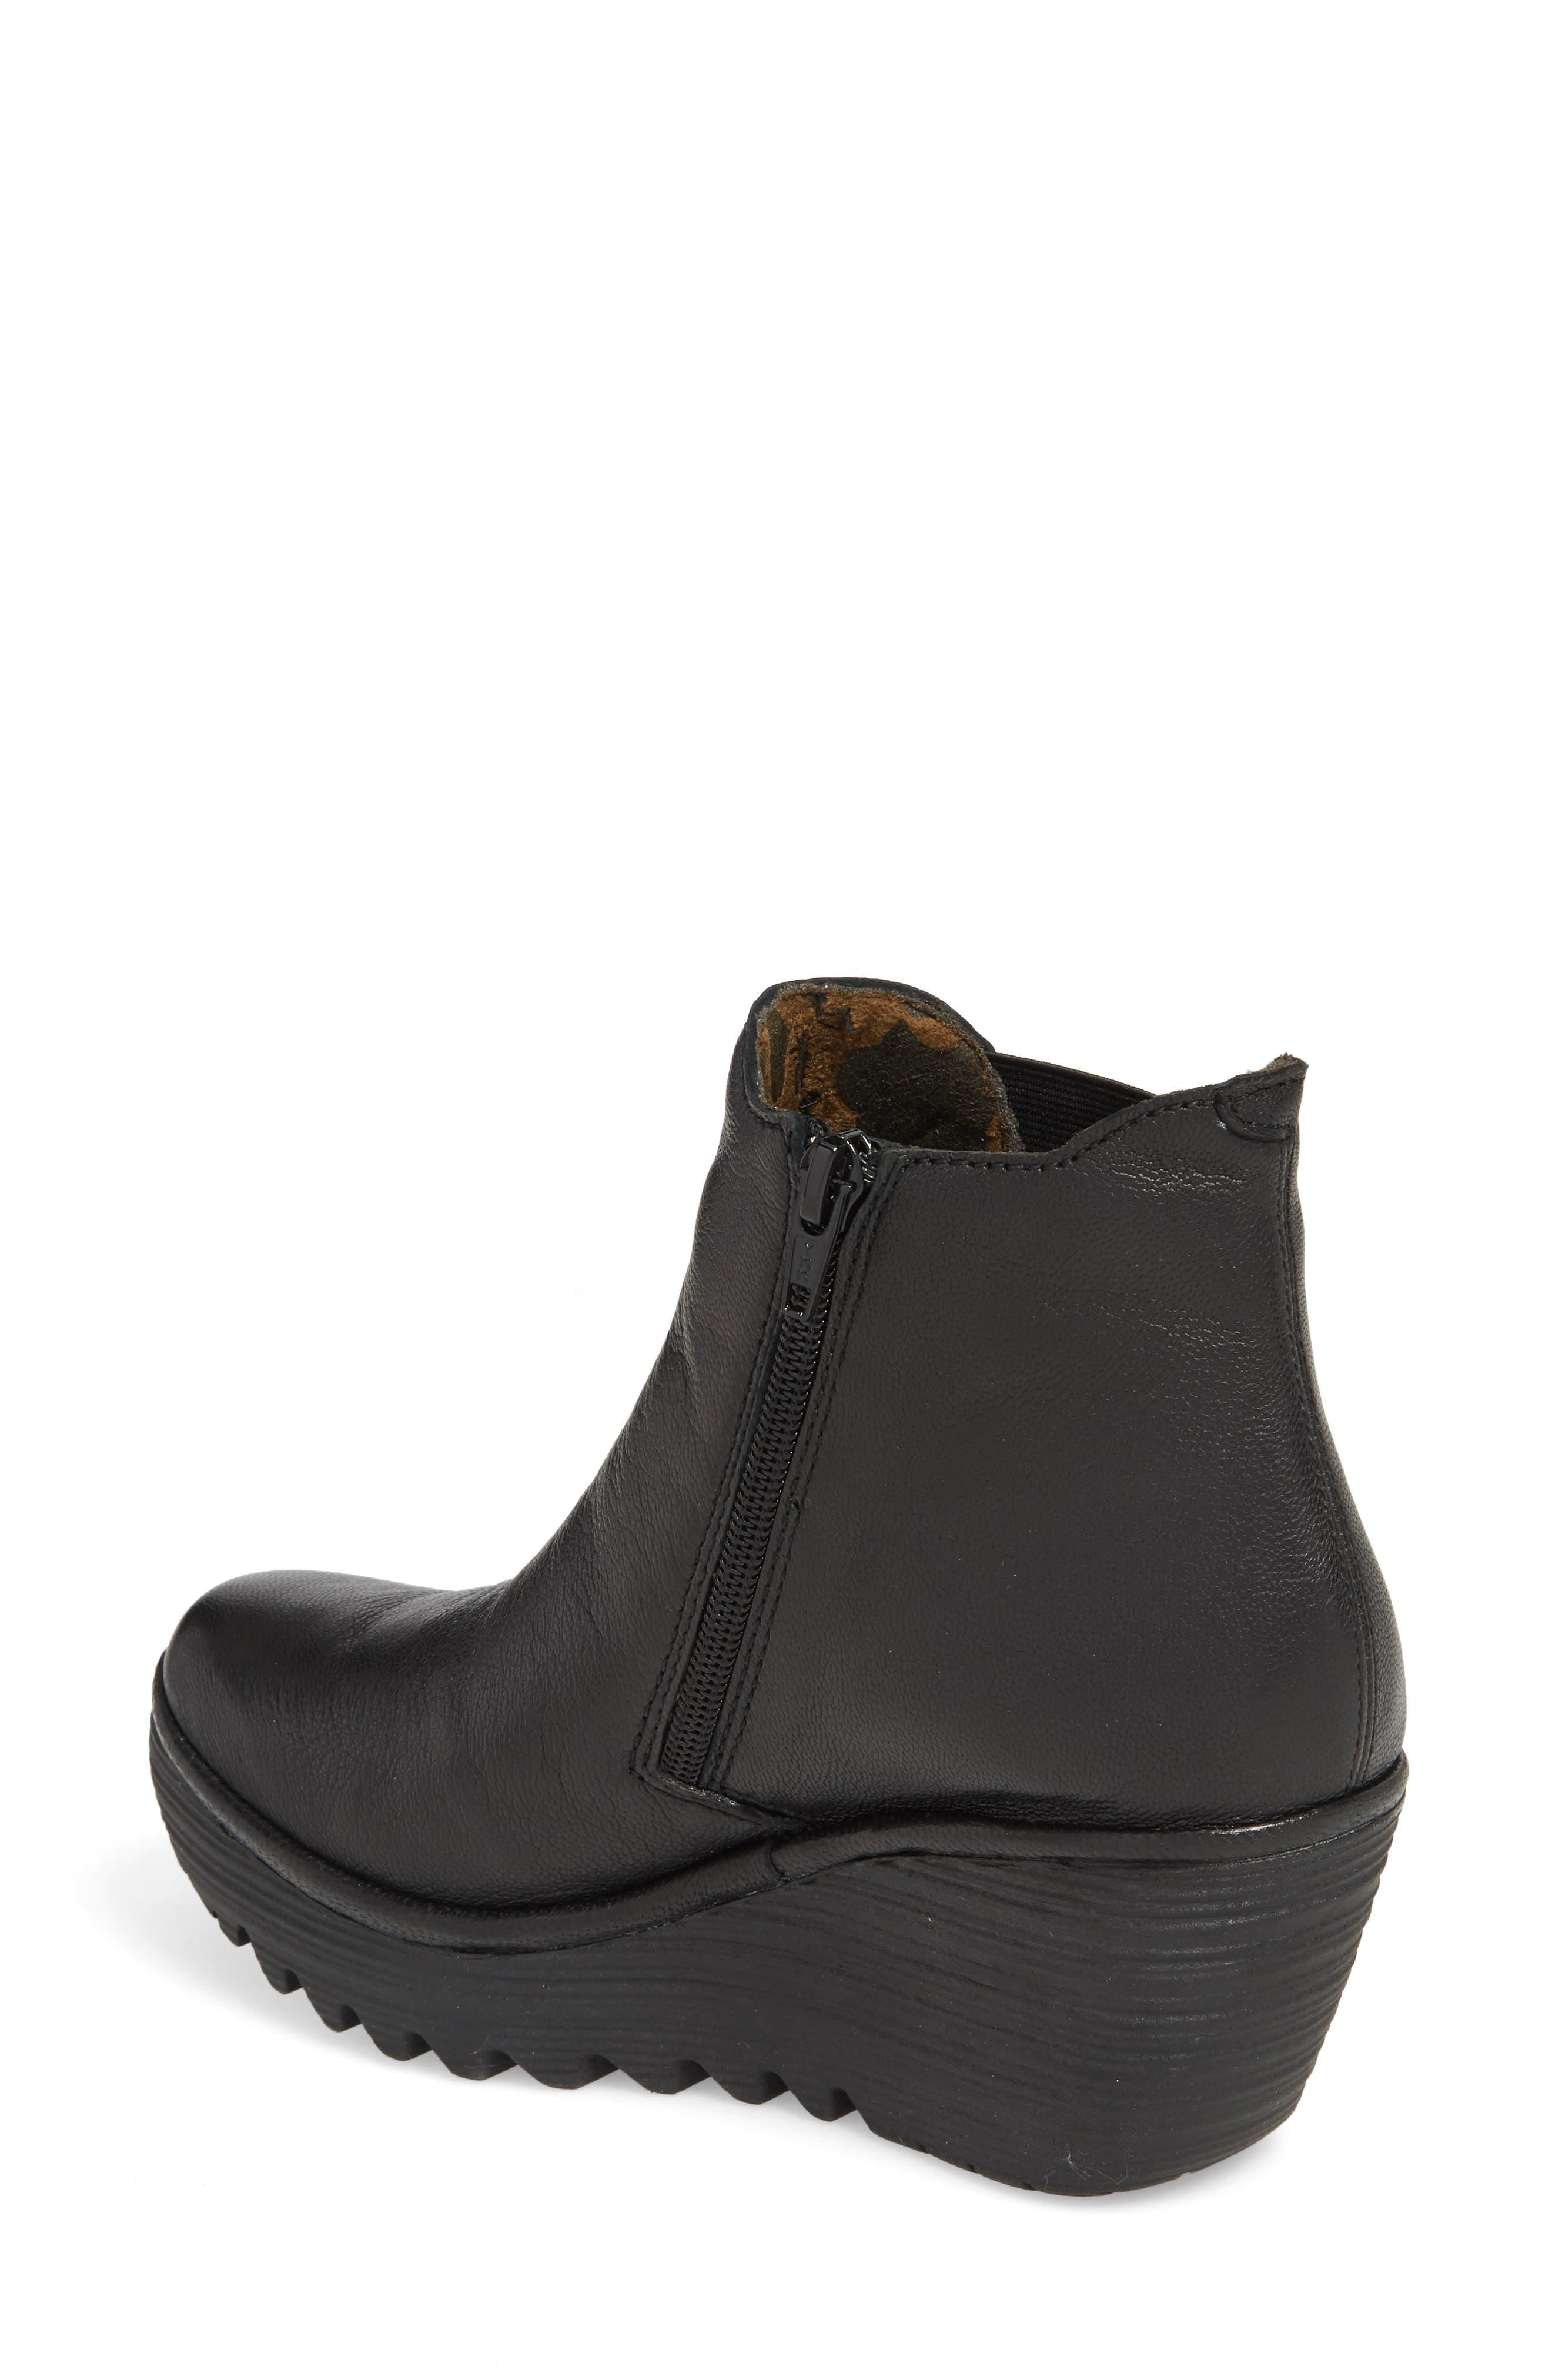 FLY LONDON, Yozo Wedge Boot, Alternate thumbnail 2, color, BLACK